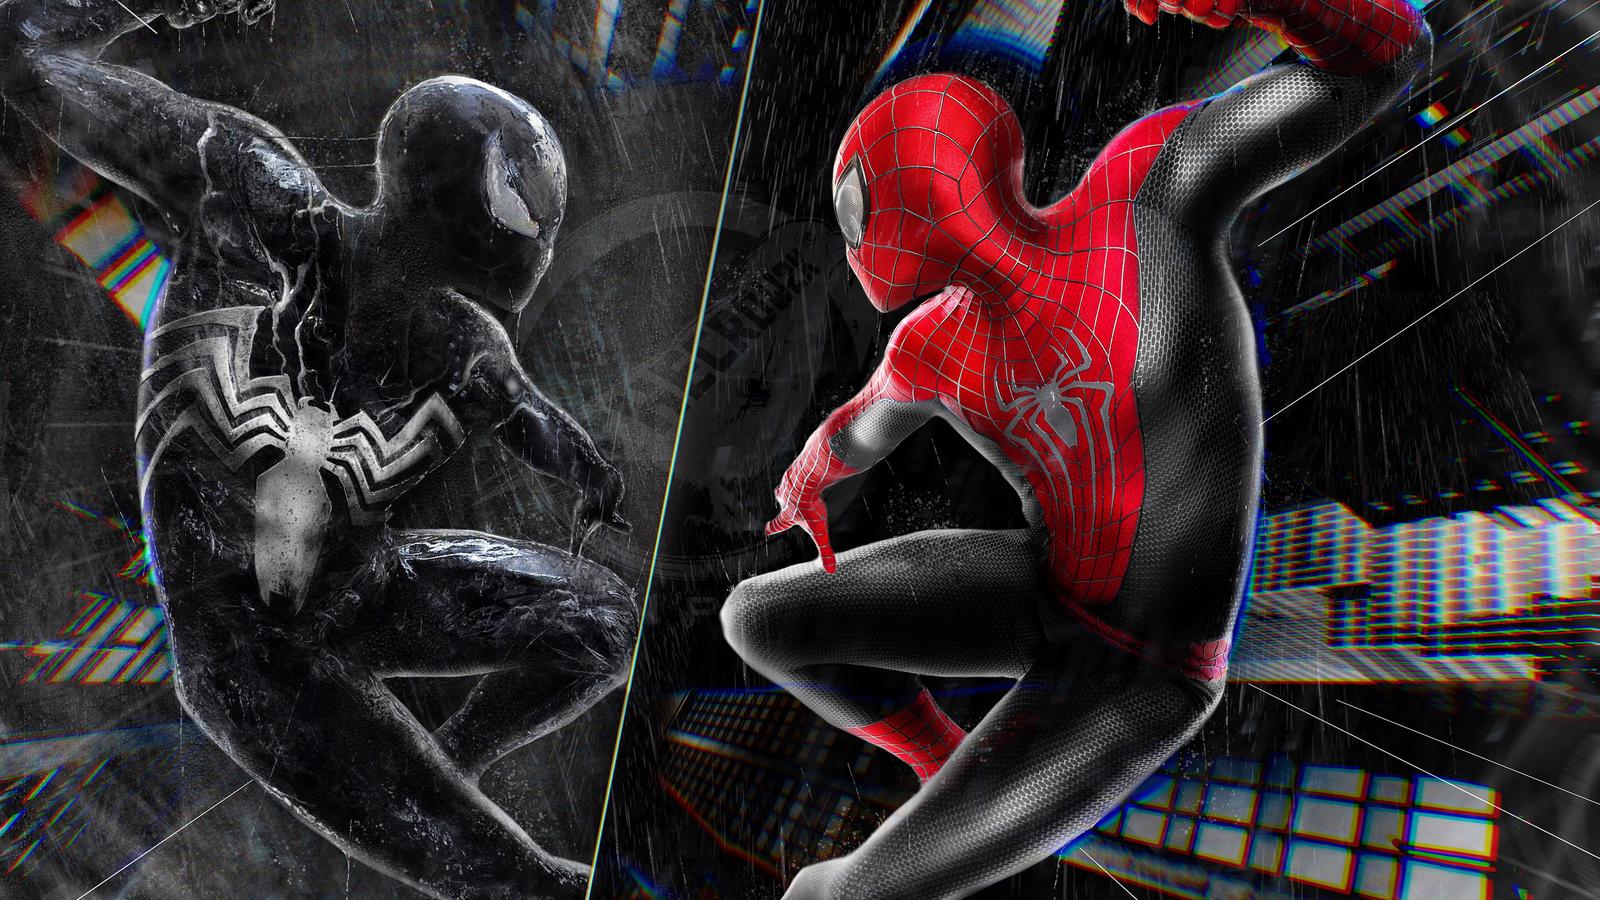 the-amazing-spider-man-3-embrace-the-darkness-4k-u1.jpg